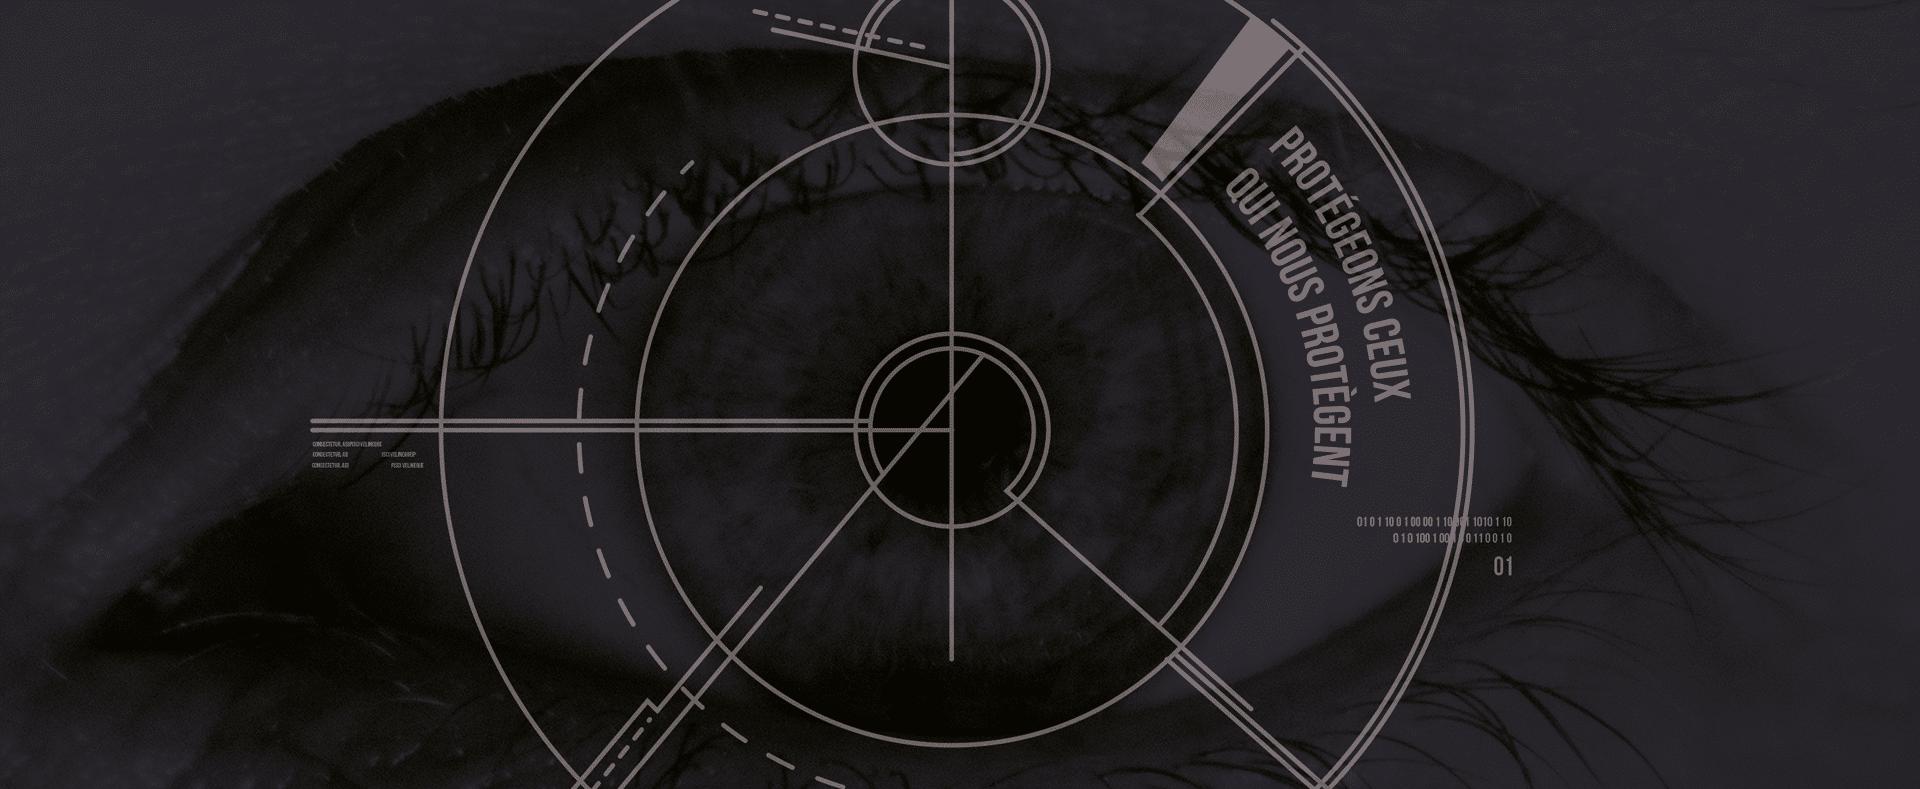 Visuel illustrant la marque Sentinel.